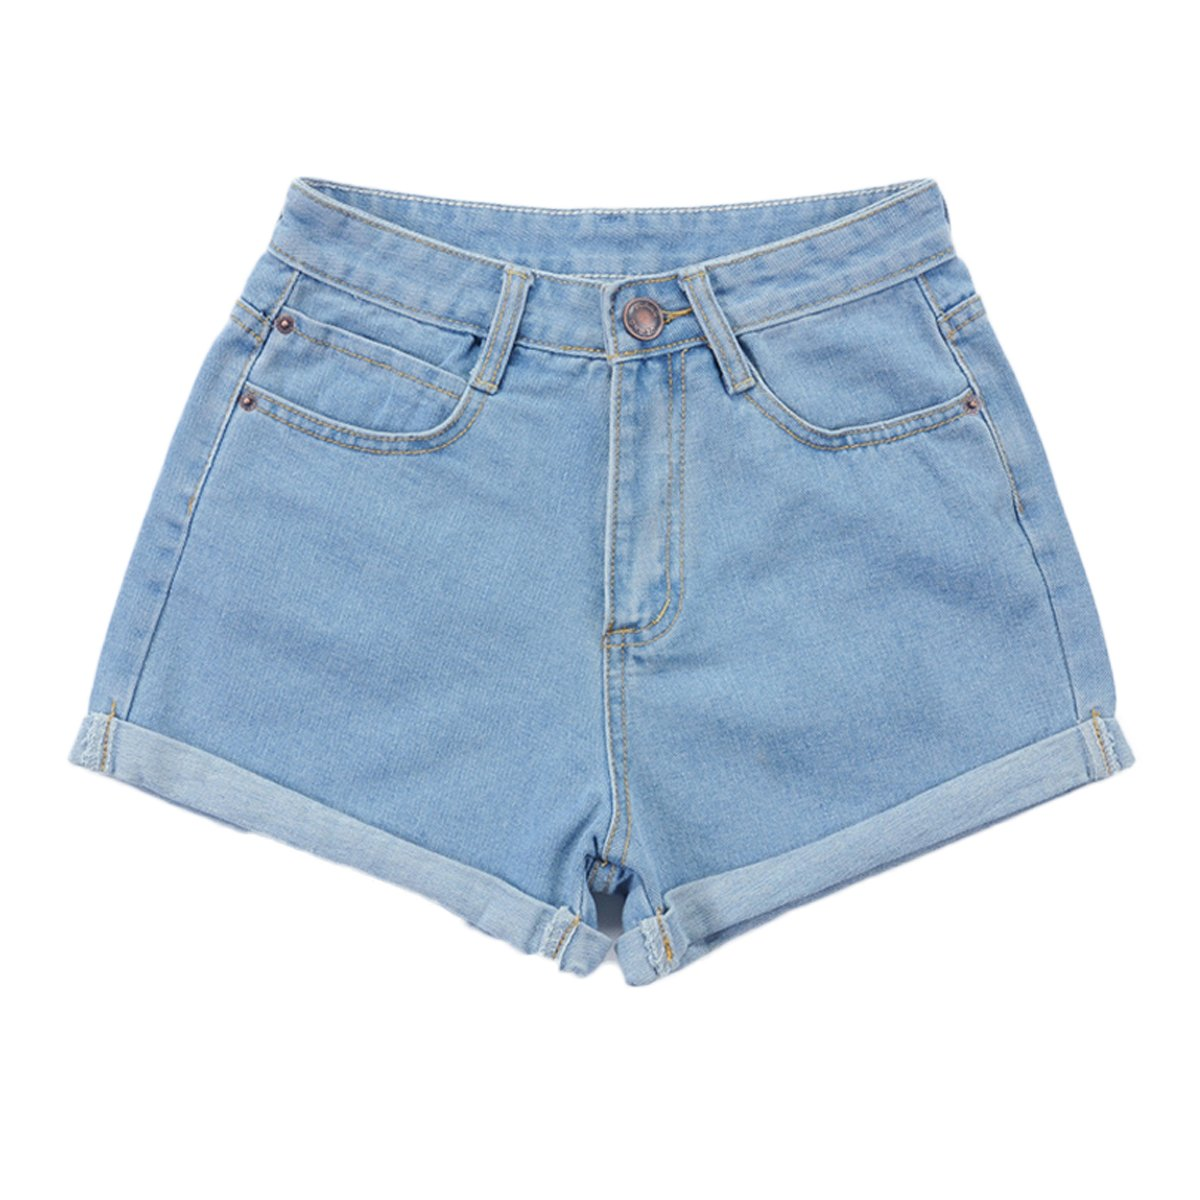 925336a150d6f Womtop Summer Women Shorts Vintage Retro Junior Jean Shorts High Waist  Crimping Denim ...